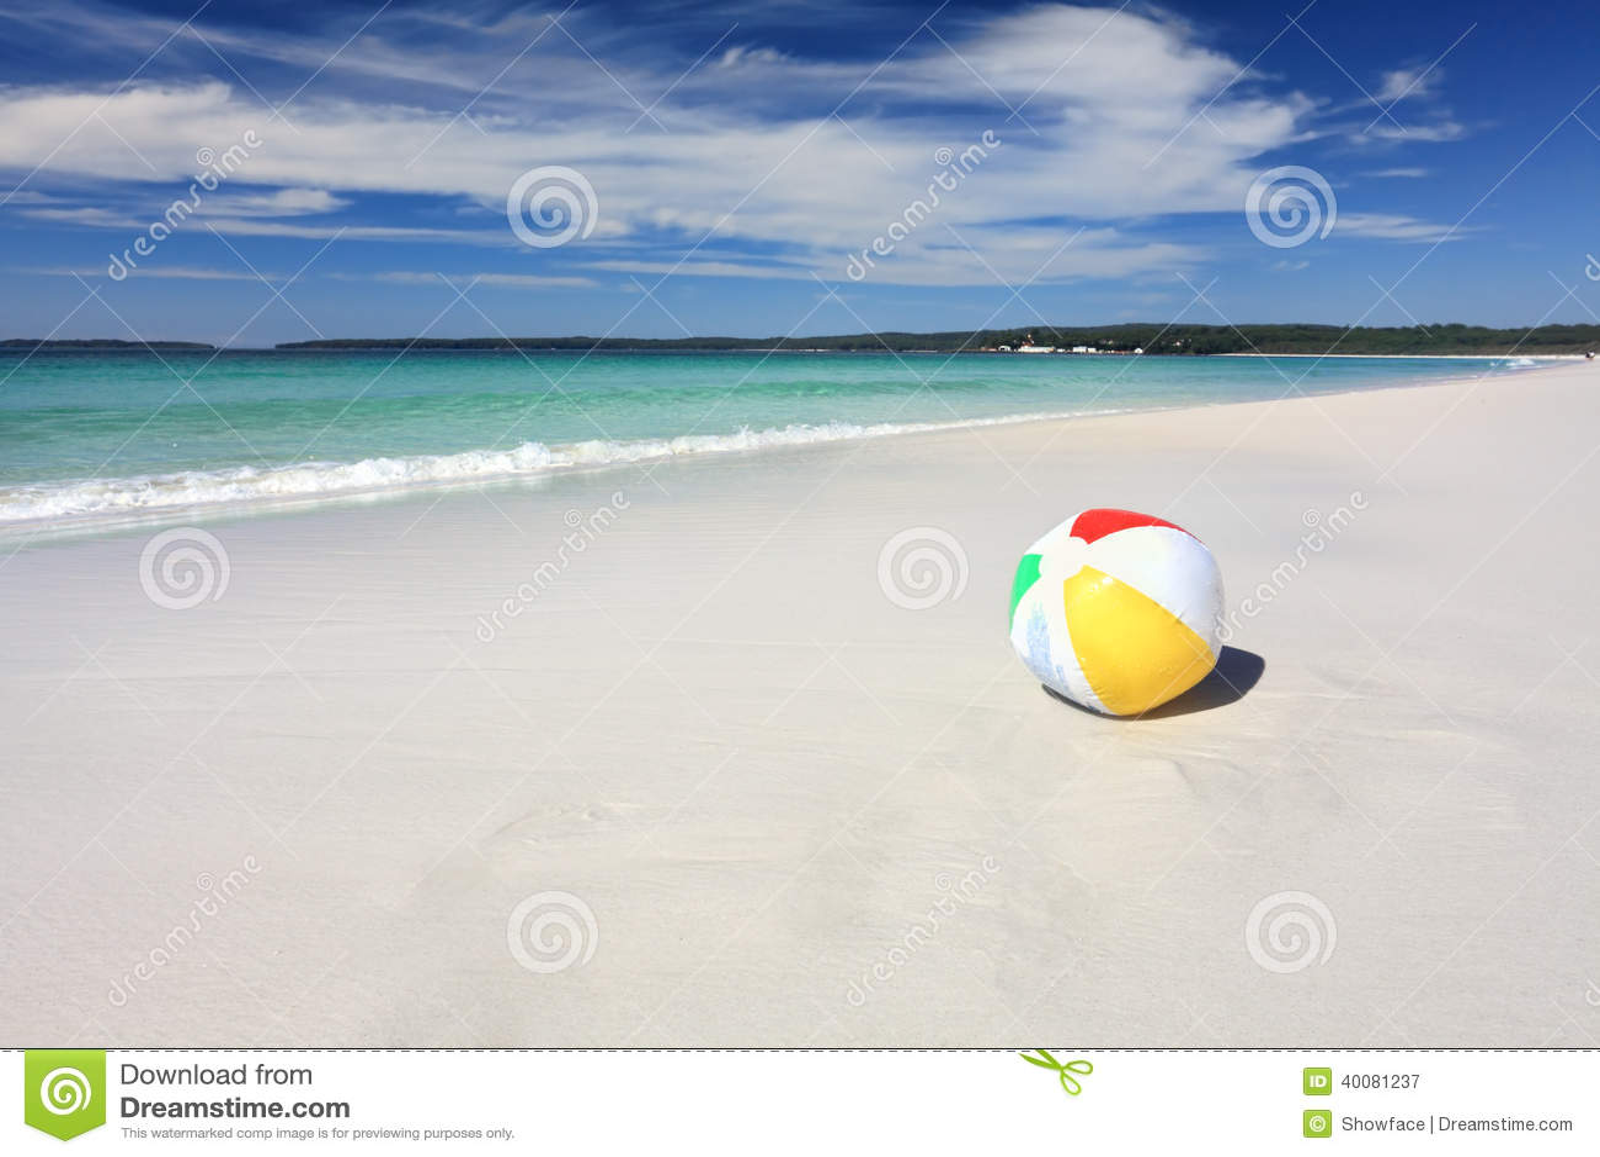 Beach ball in ocean Lost Colourful Beach Ball On The Seashore By The Ocean Dreamstimecom Colourful Beach Ball On The Seashore By The Ocean Stock Image